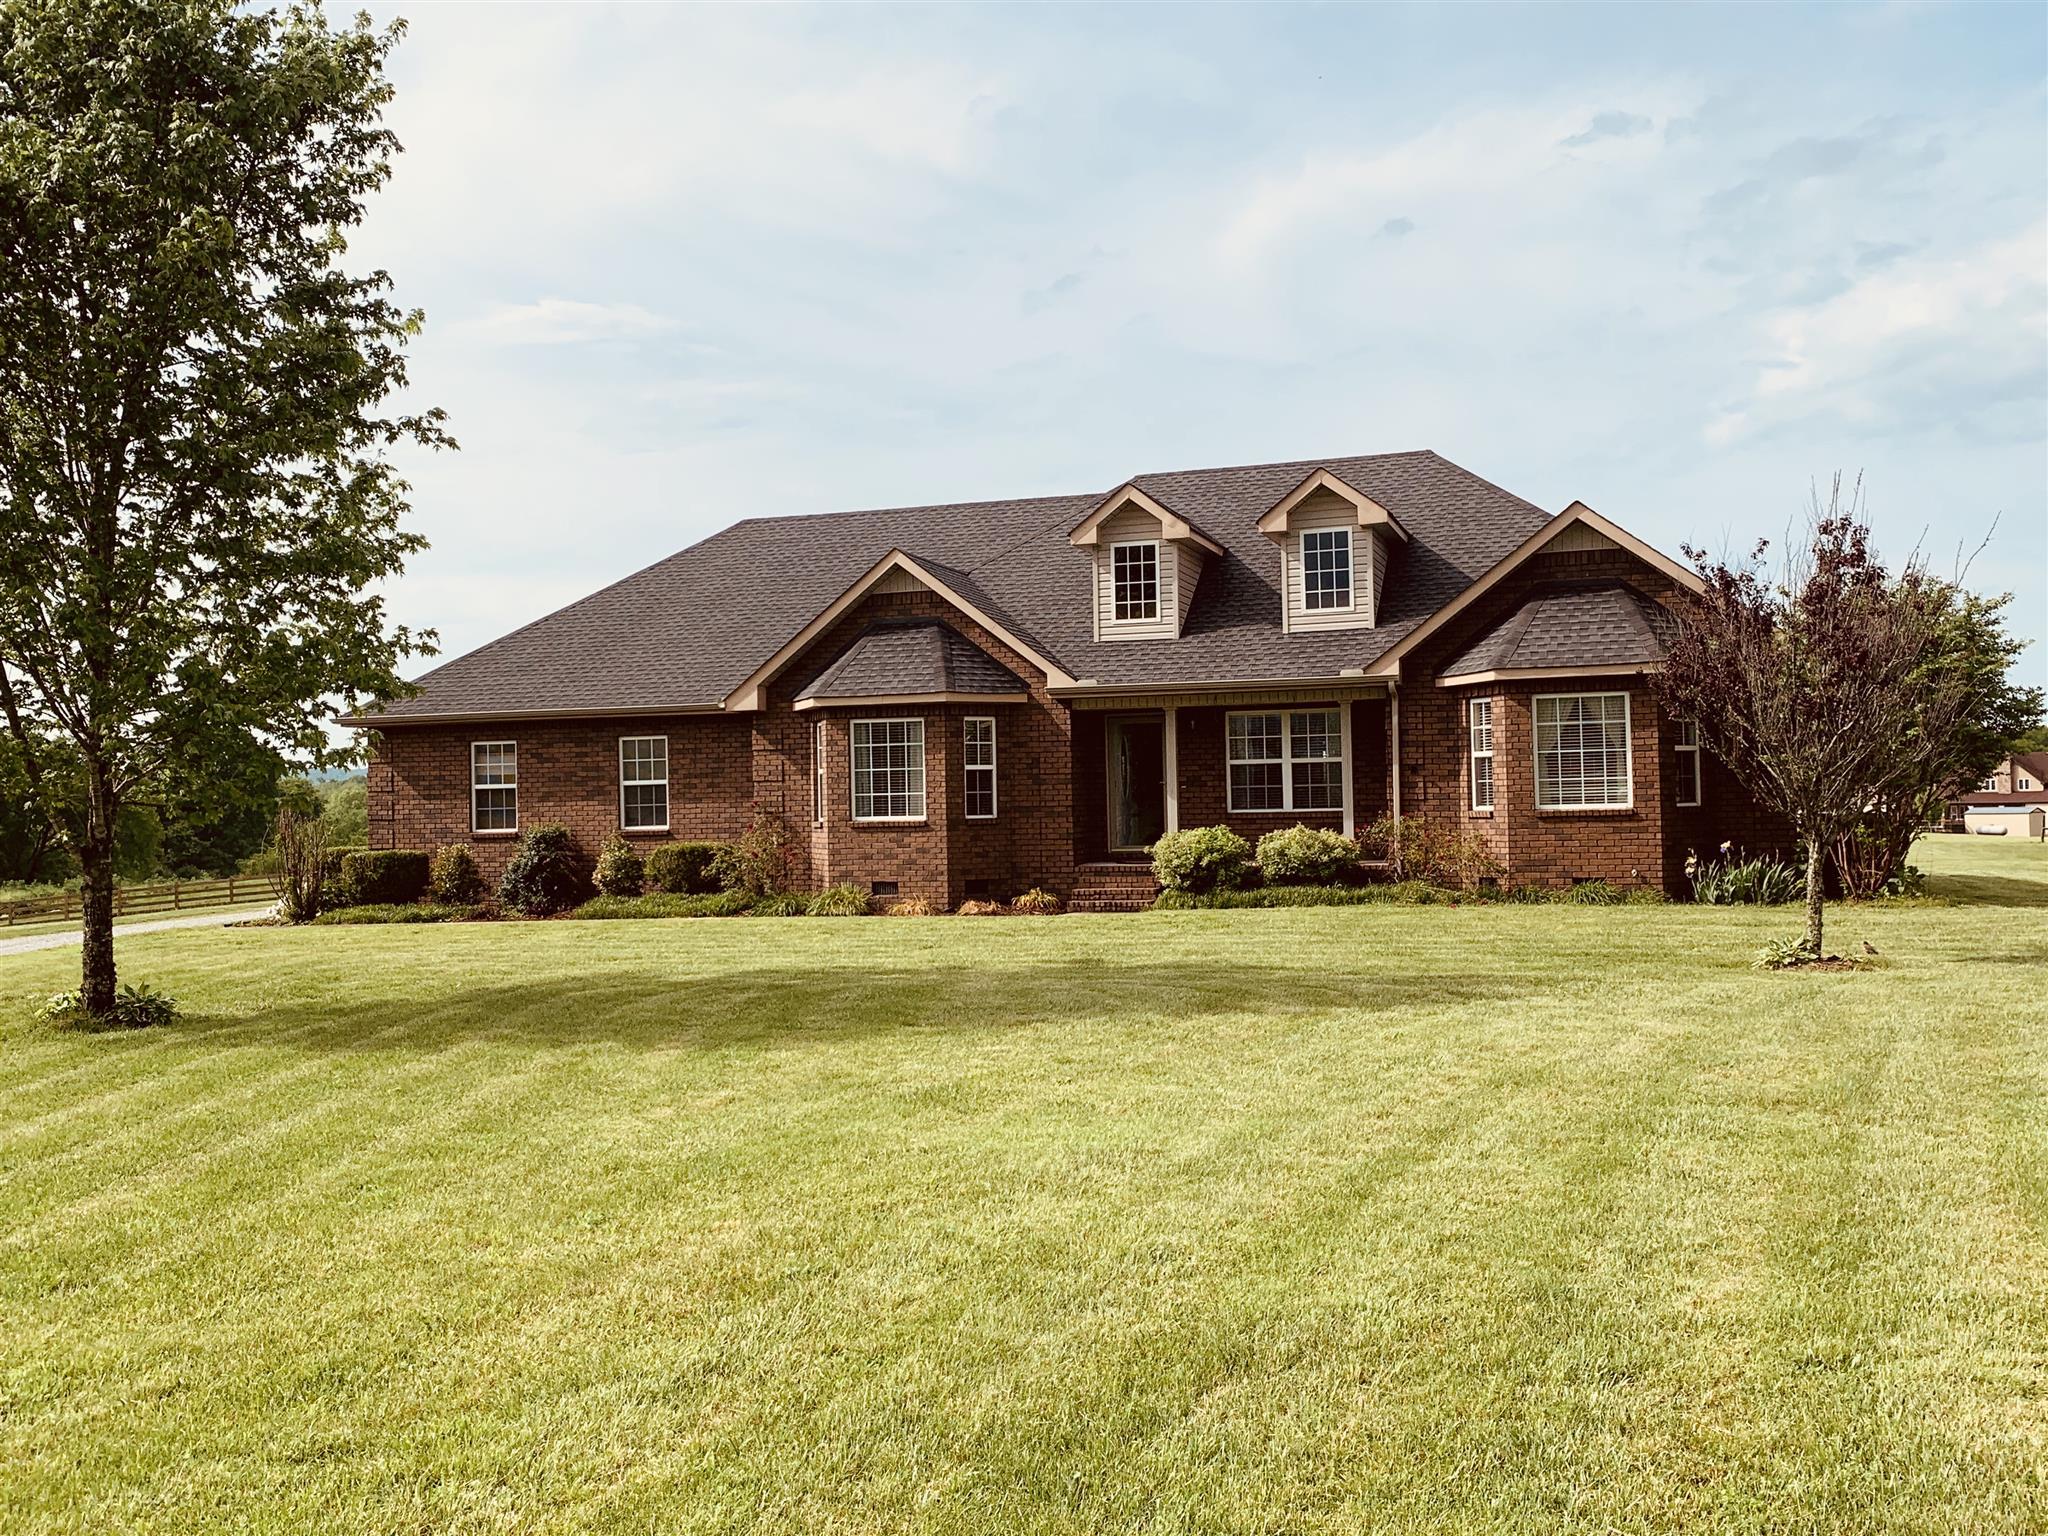 1030 Meridian Drive, Castalian Springs, TN 37031 - Castalian Springs, TN real estate listing